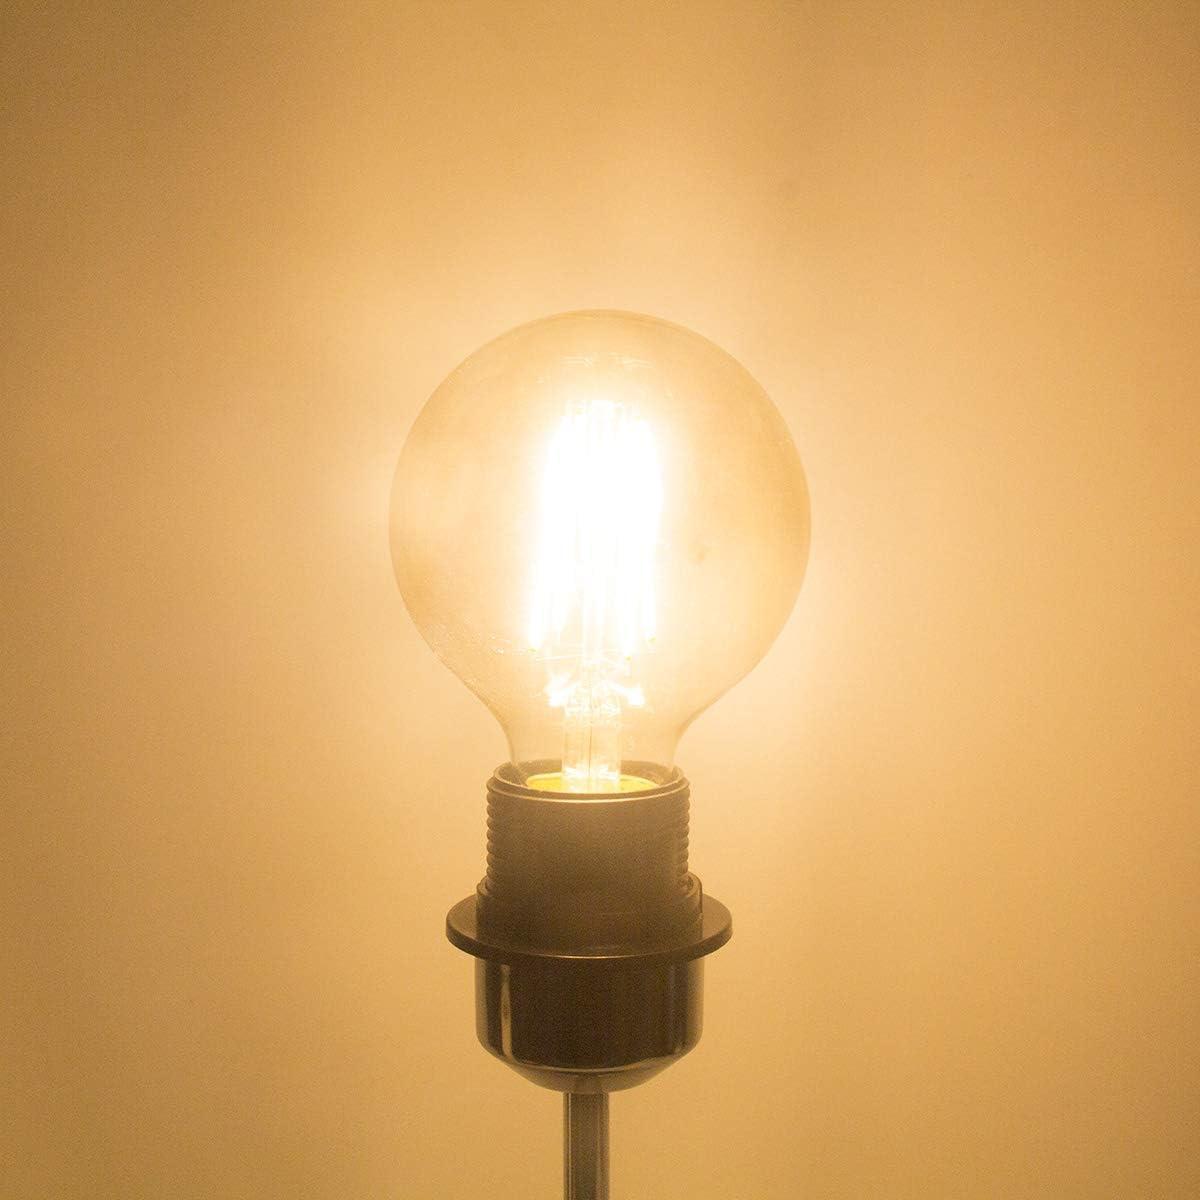 Daylight 6 Pack E26 Base Pack Of 6 Dimmable Edison Led Globe Light Bulb G25 Daylight